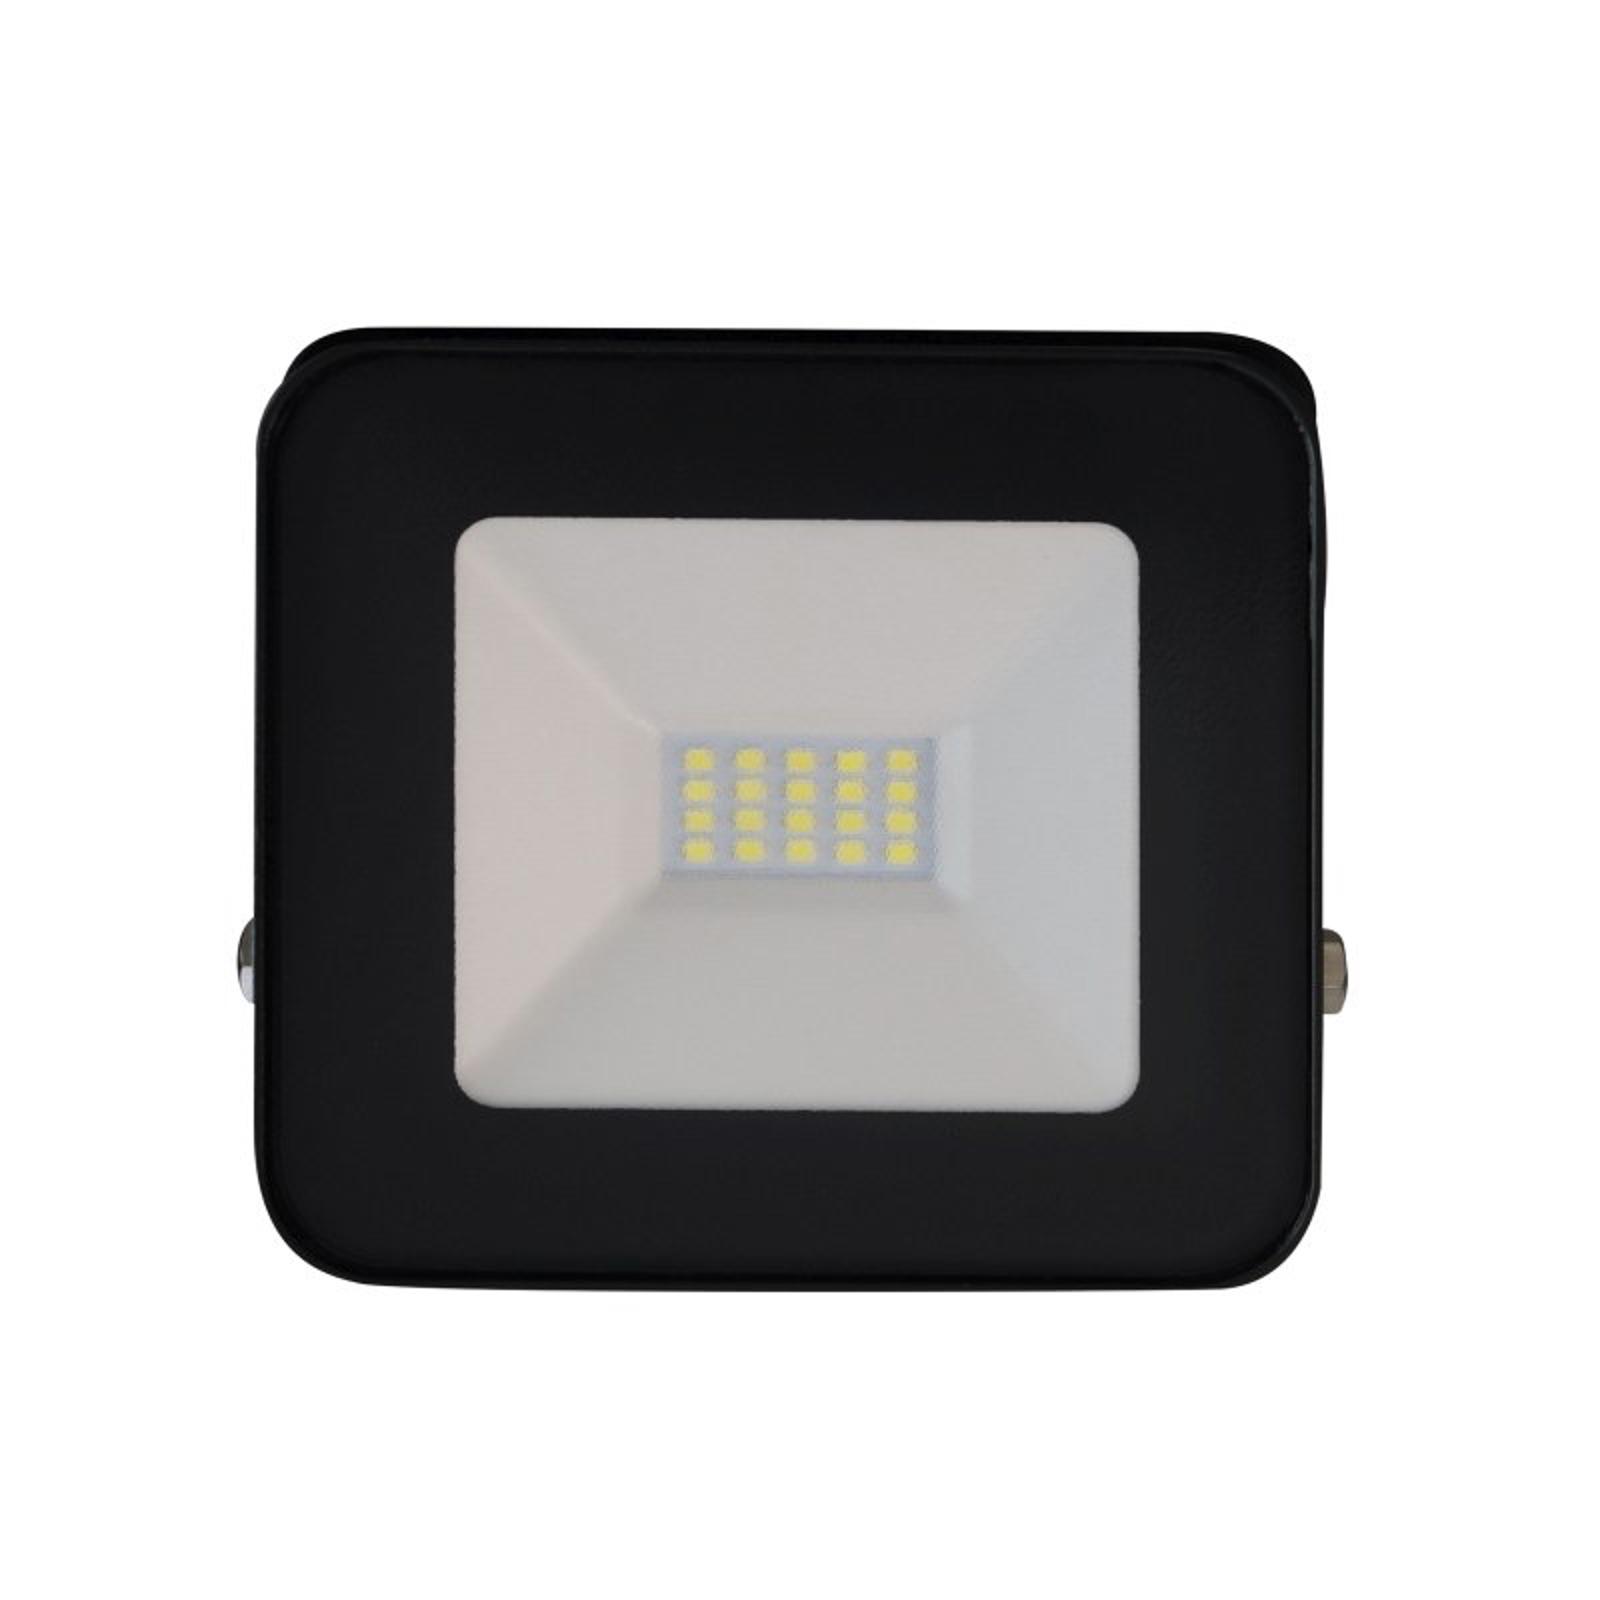 John-LED-kohdevalaisin ulos, musta 20 W